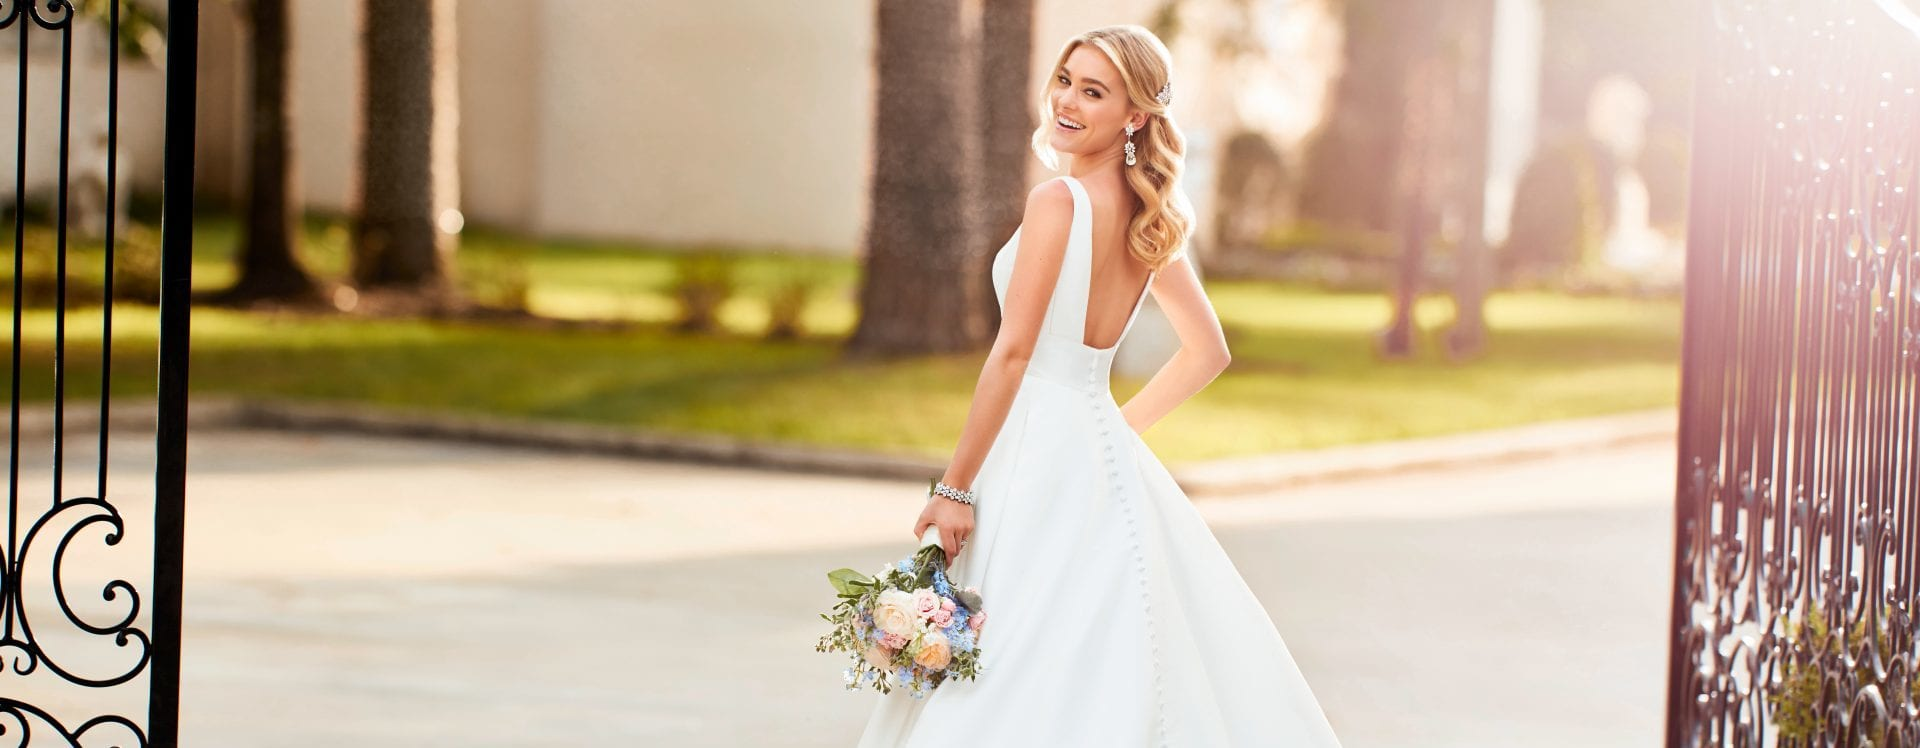 Image of Stella York Wedding Dress on Bride outside